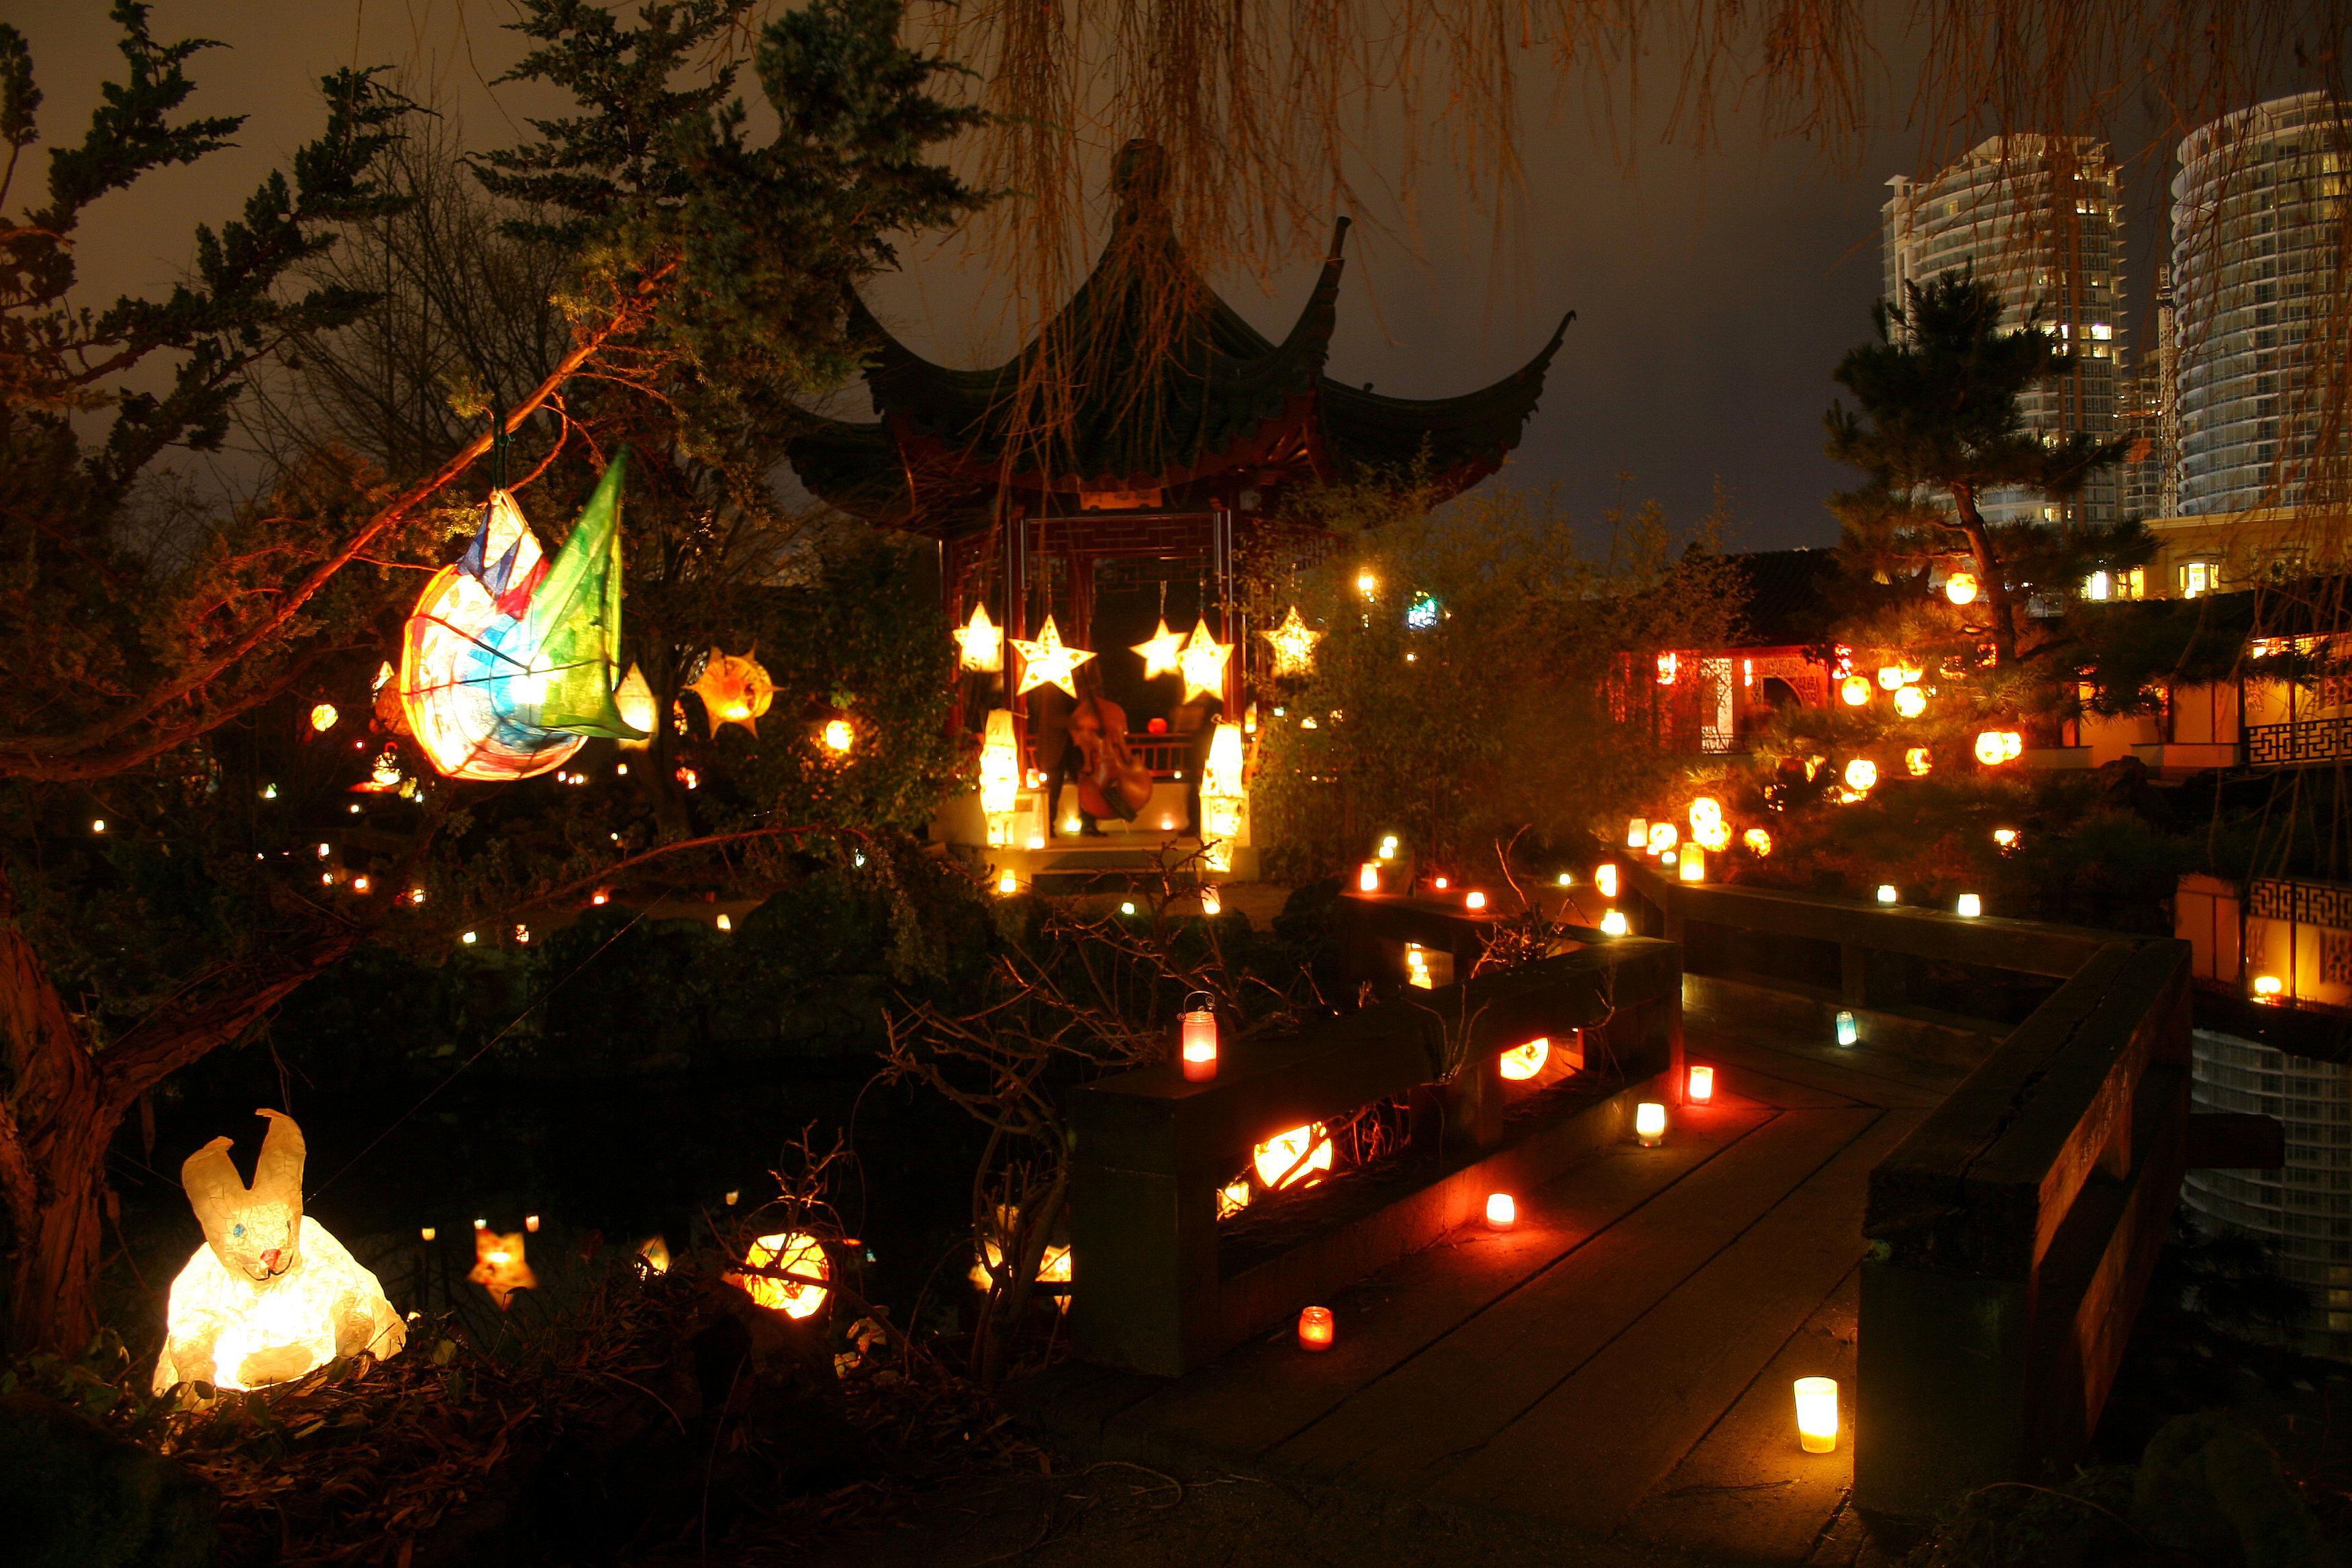 Winter Solstice Festival at Dr. Sun Yat-Sen Chinese Garden, Vancouver